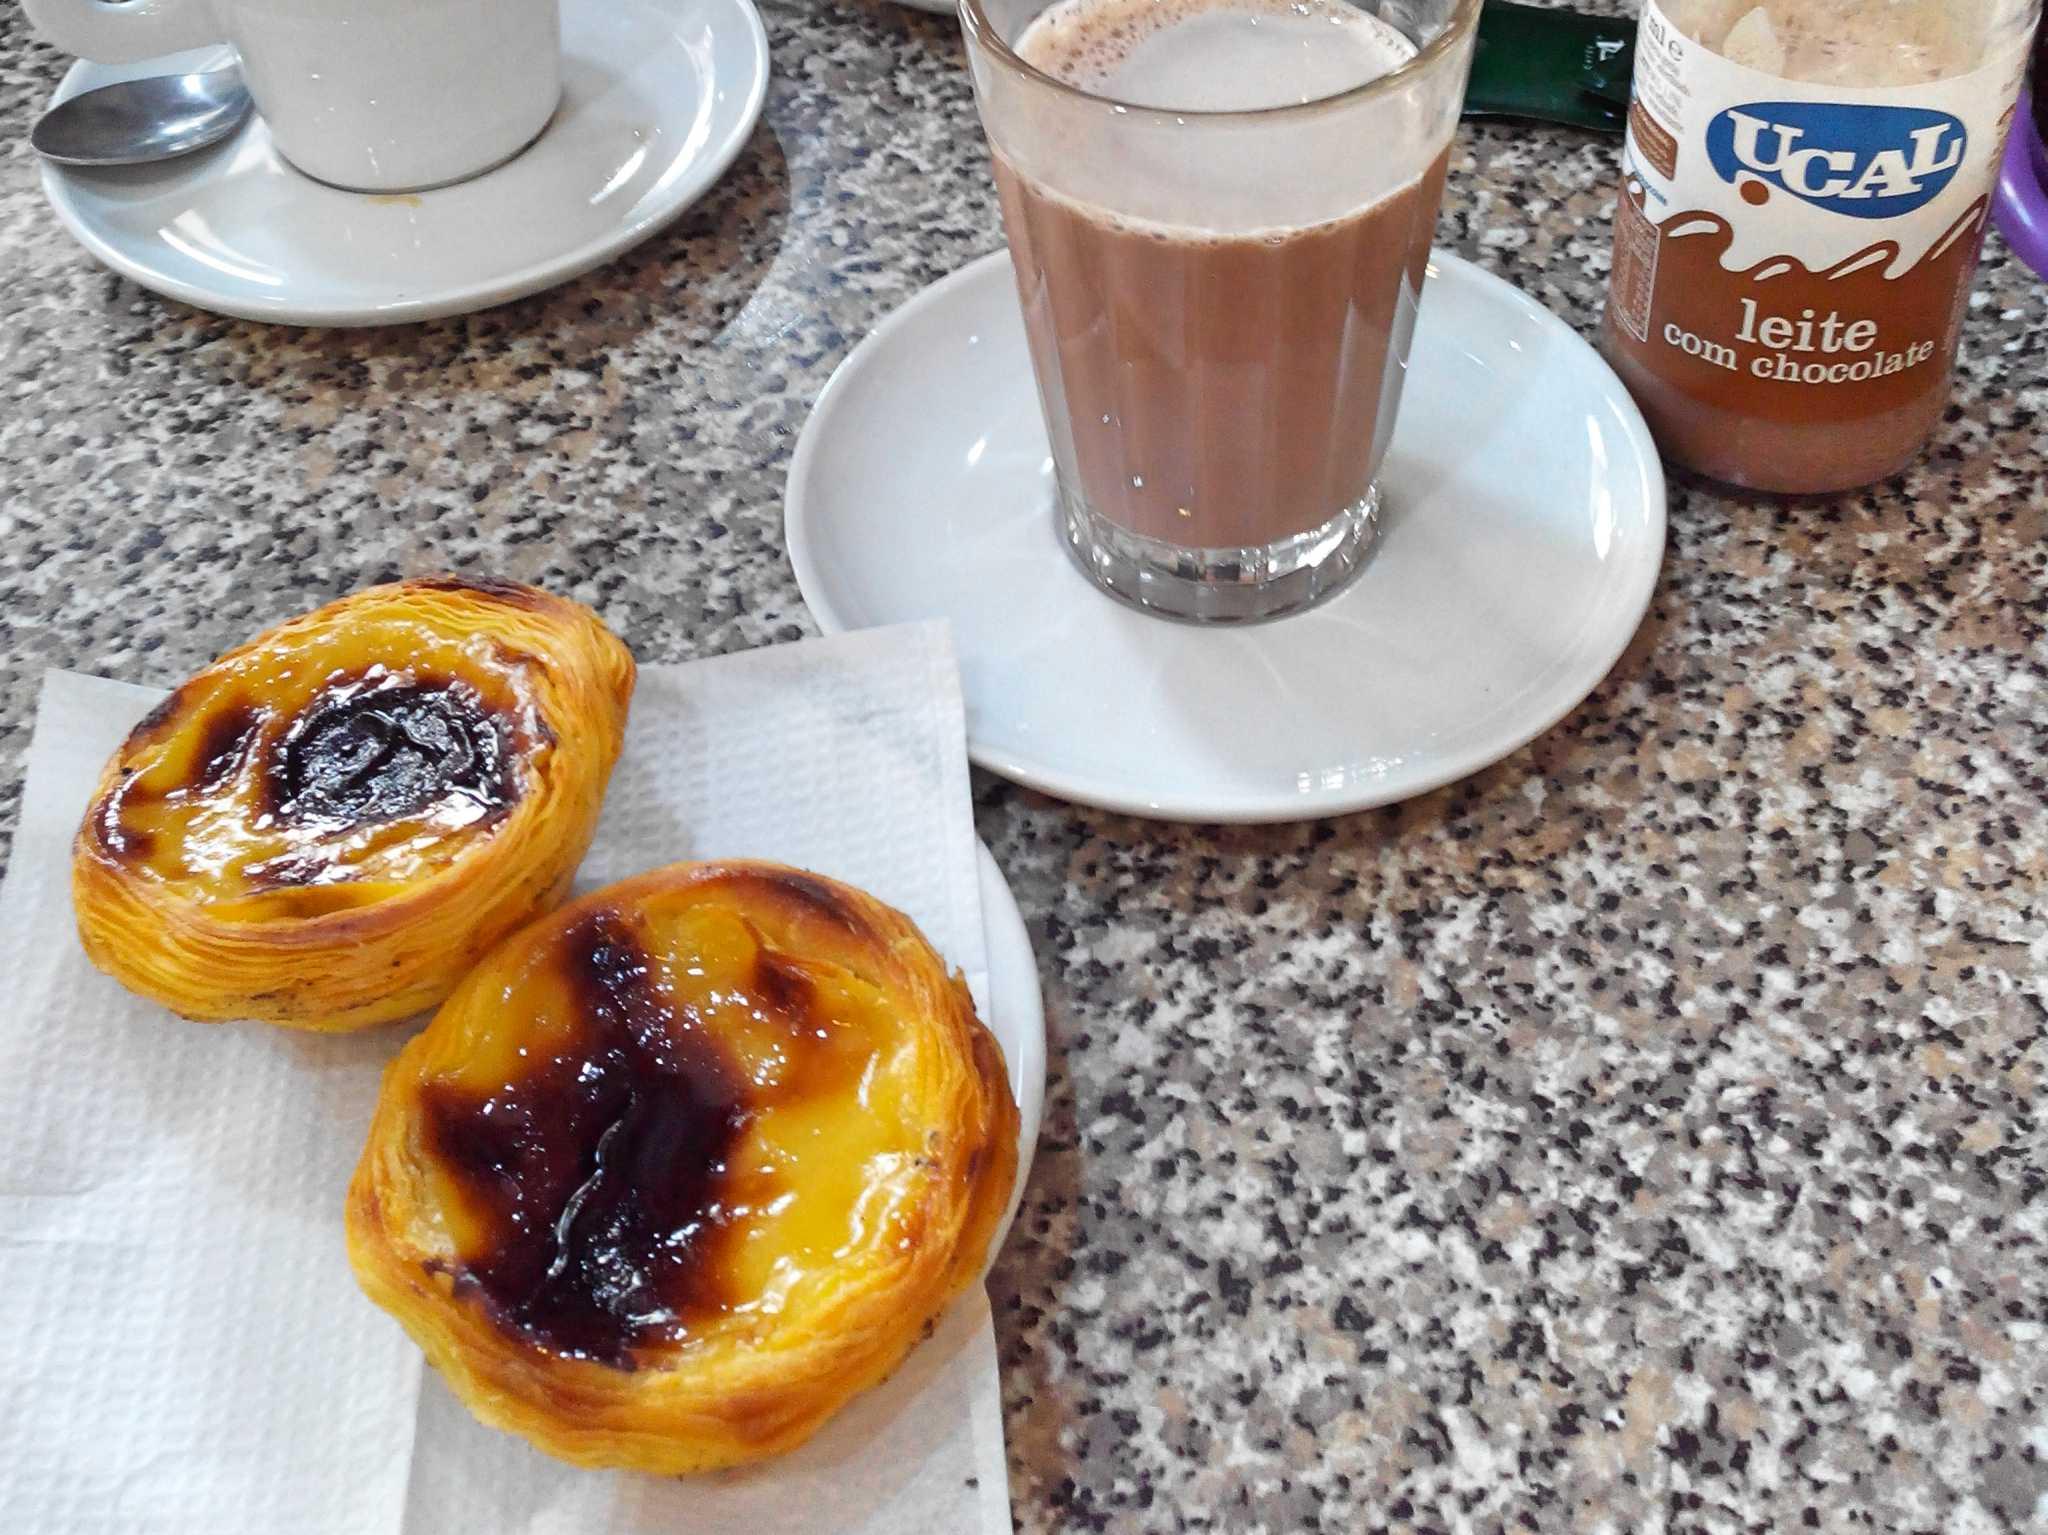 Pastel de Nata in Belém genießen. Foto: Nina Härtle